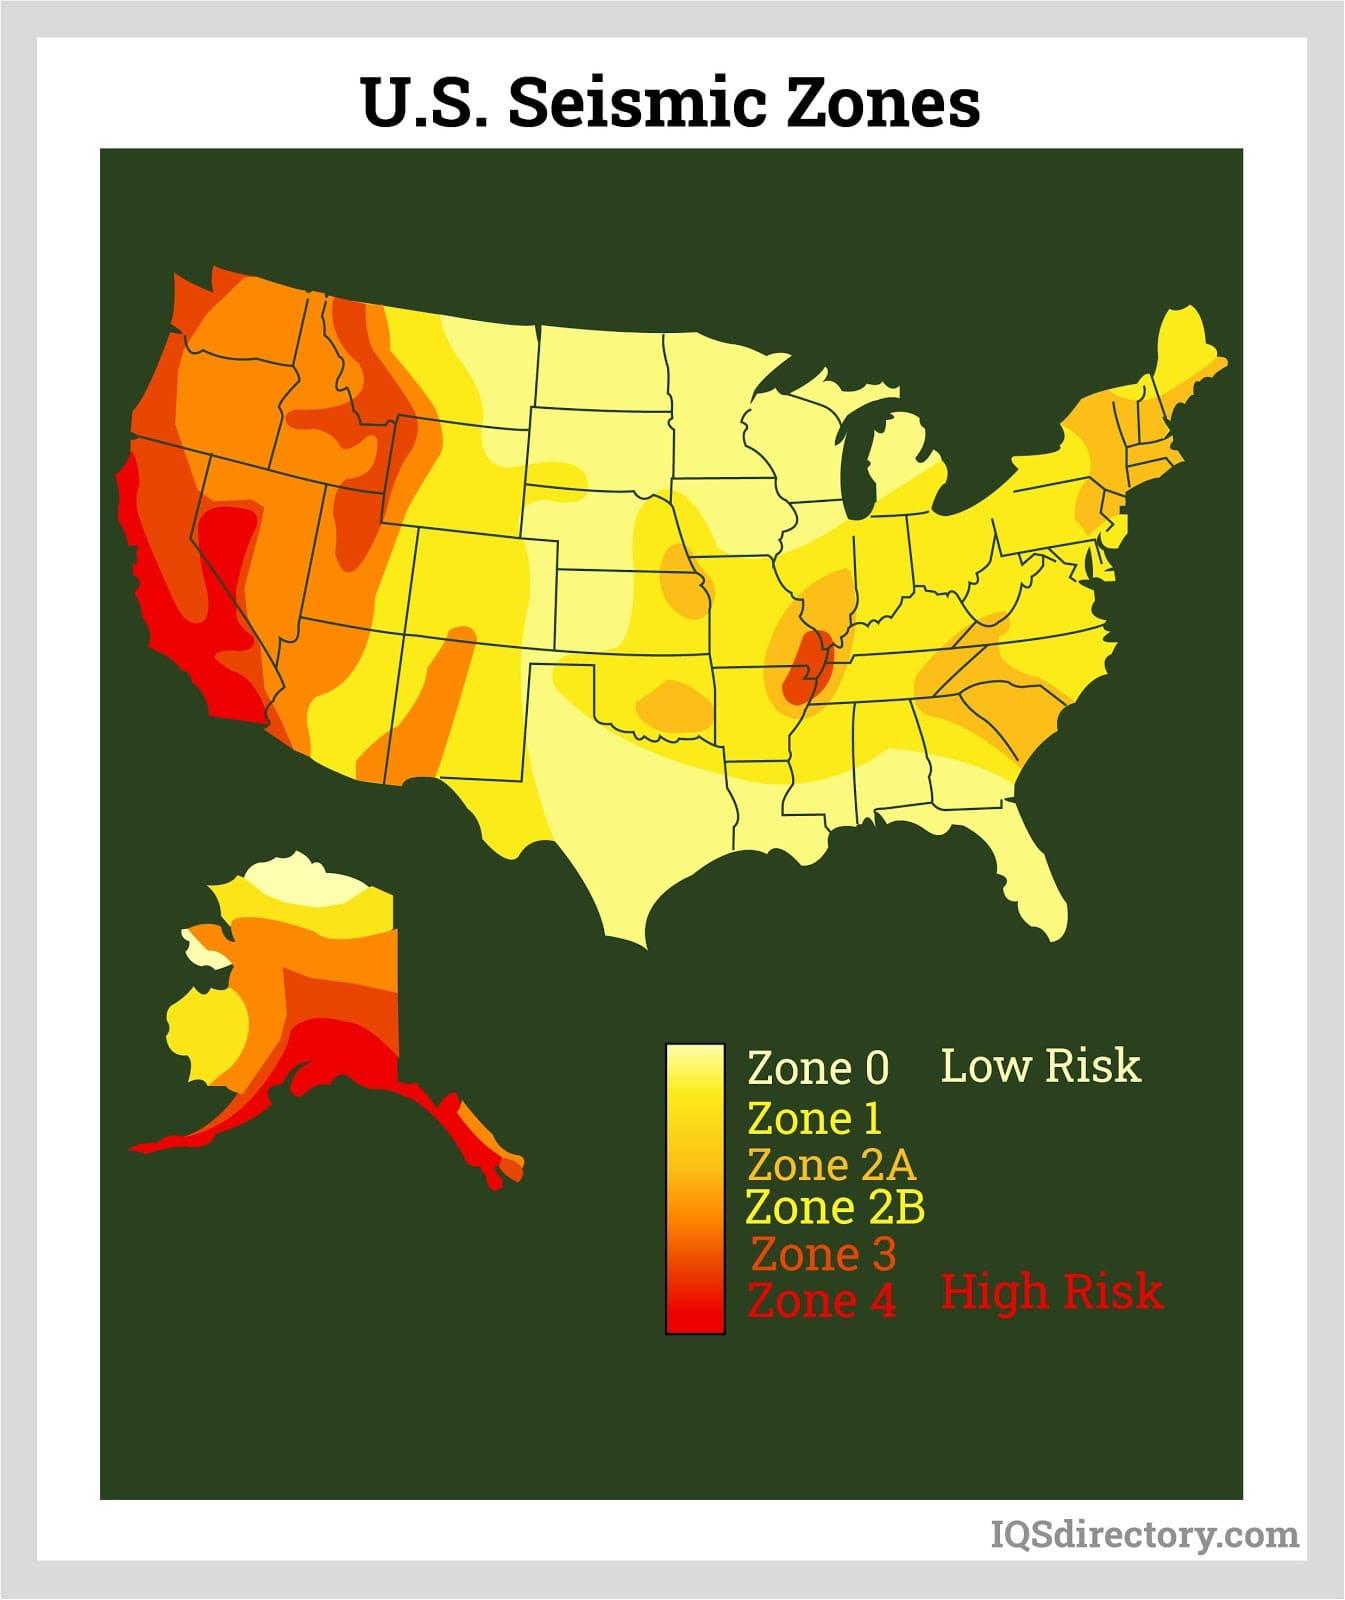 U.S. Seismic Zones